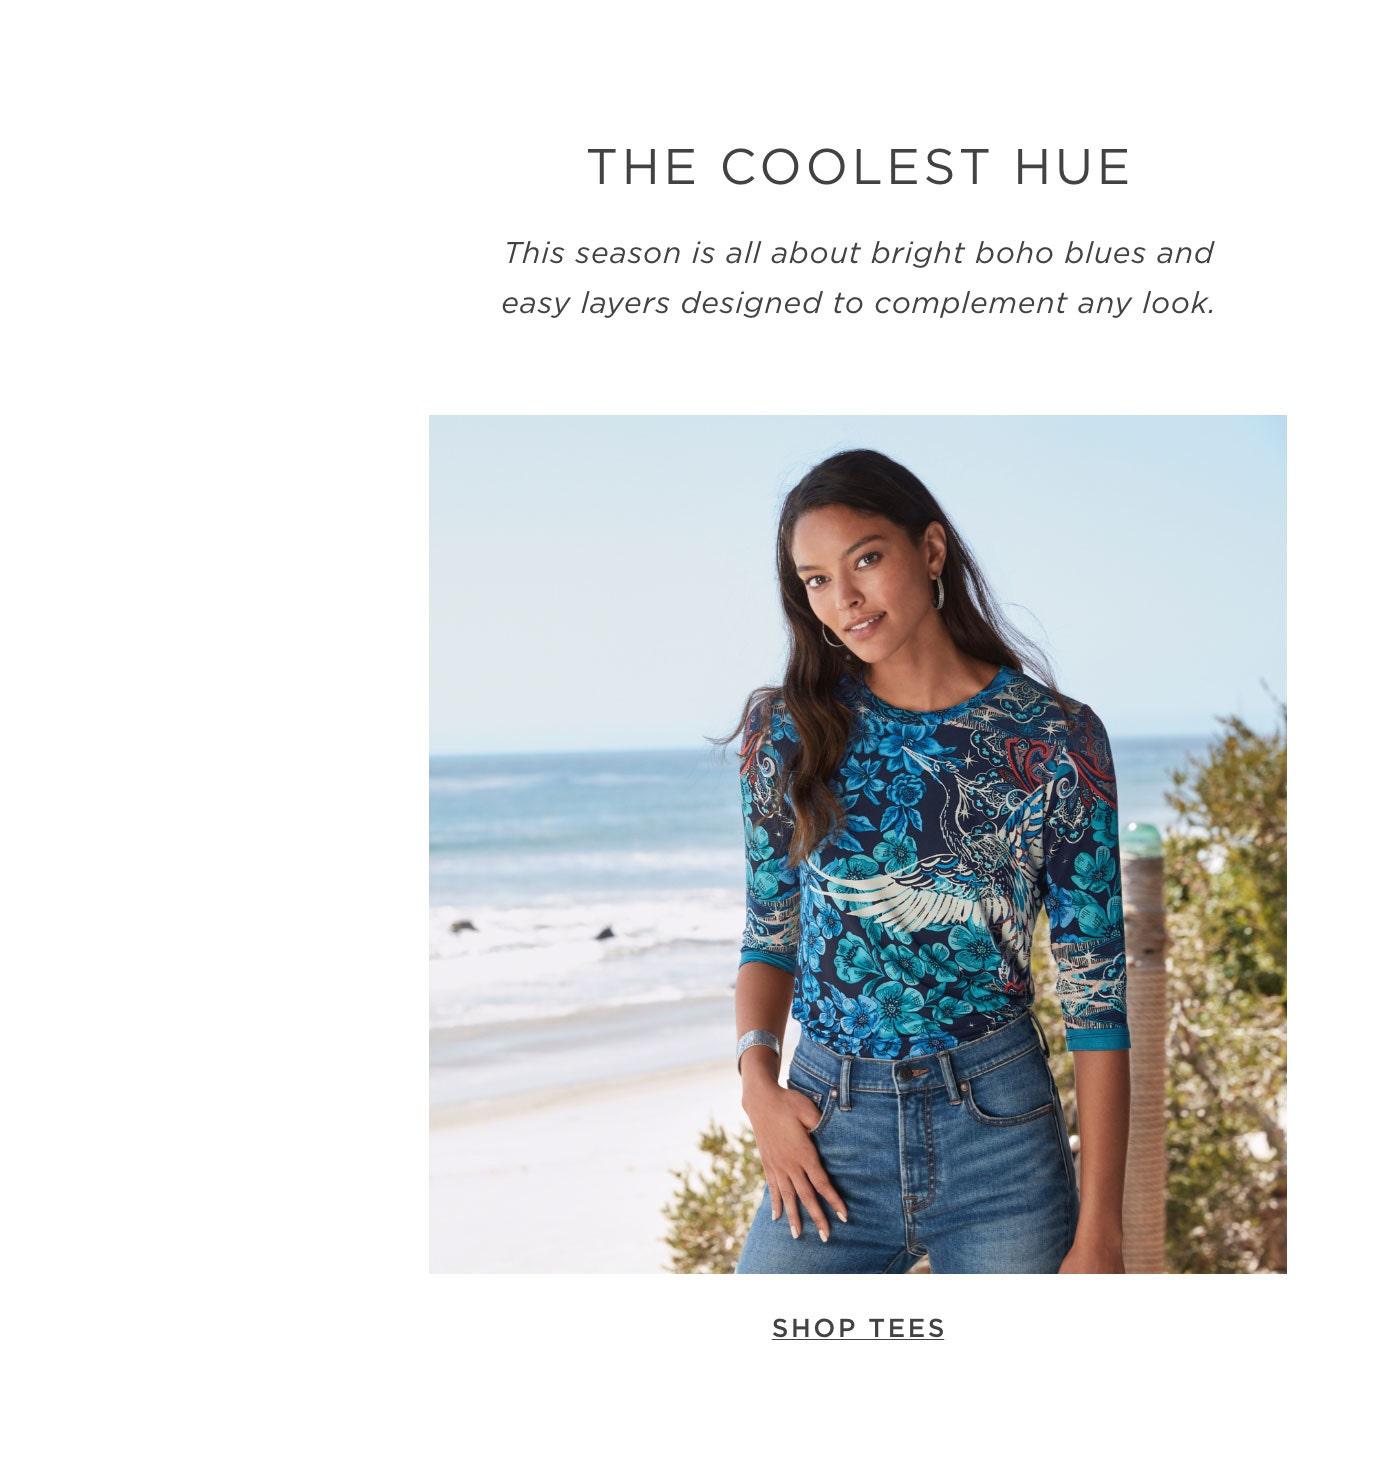 The Coolest Hue - Shop Tees